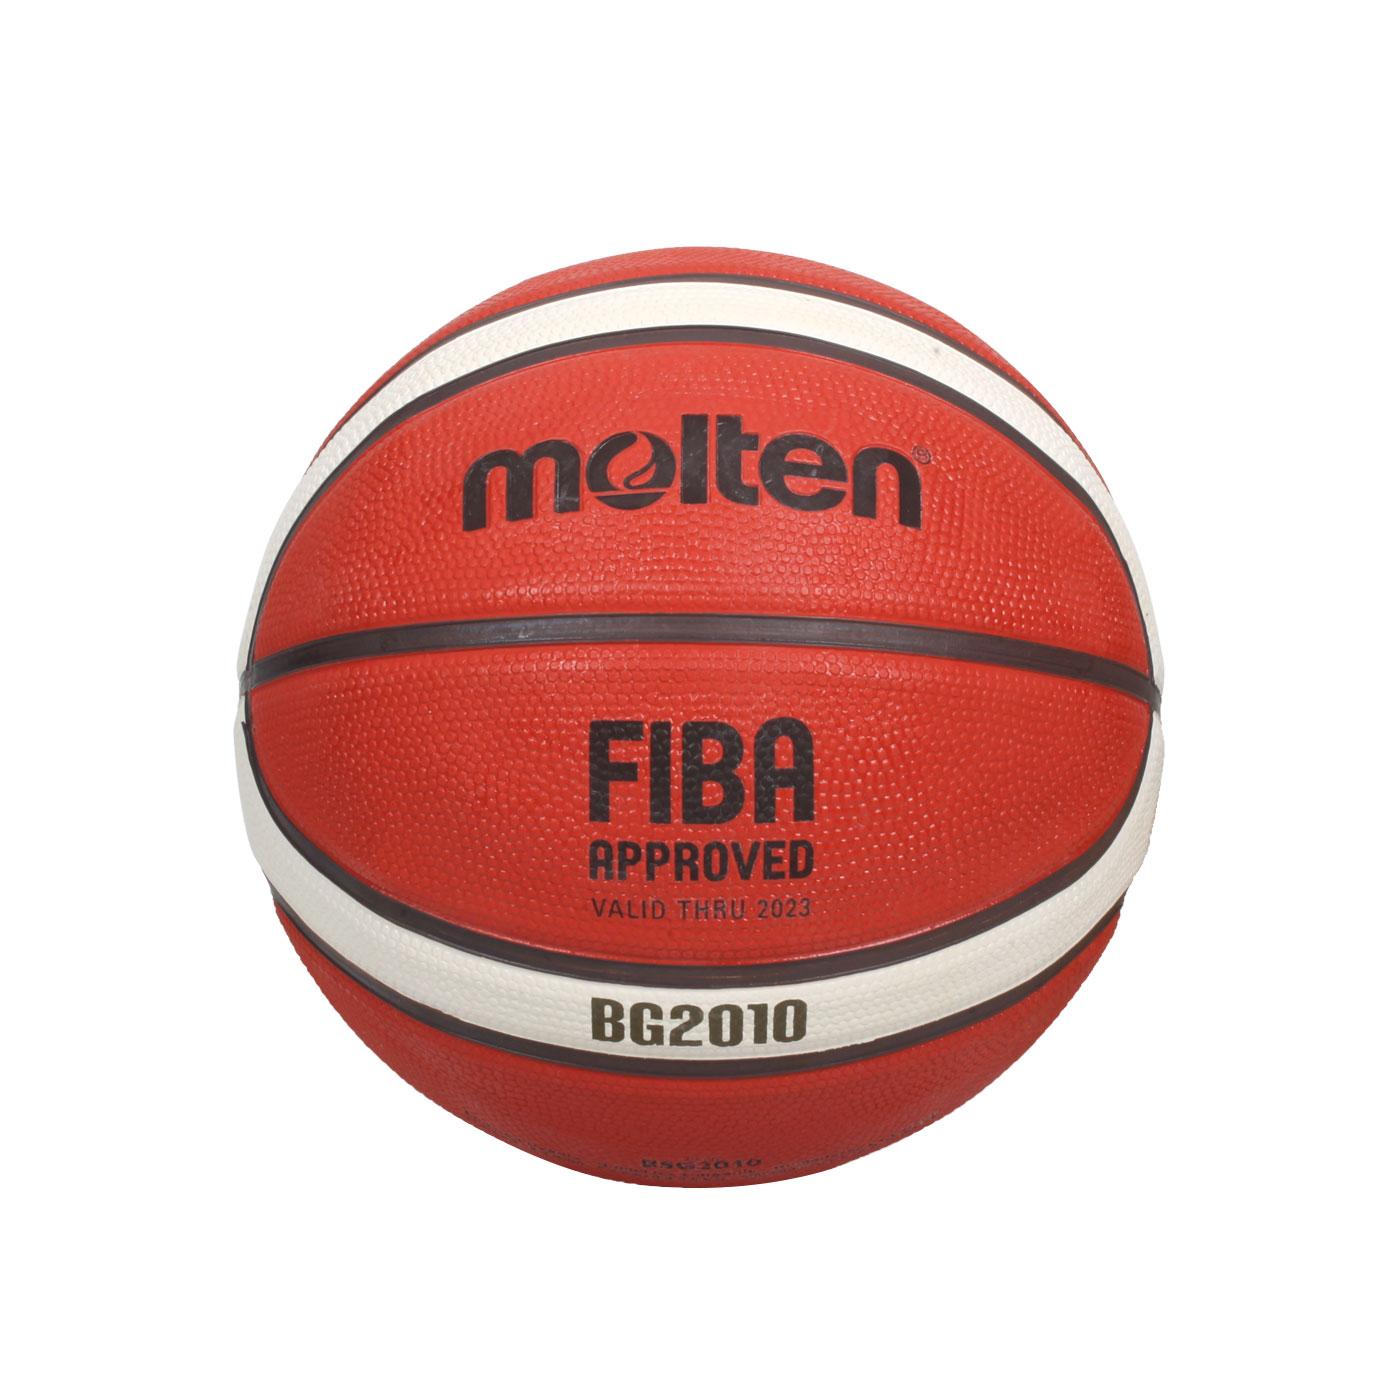 Molten 12片橡膠深溝籃球#5  B5G2010 - 橘米白黑